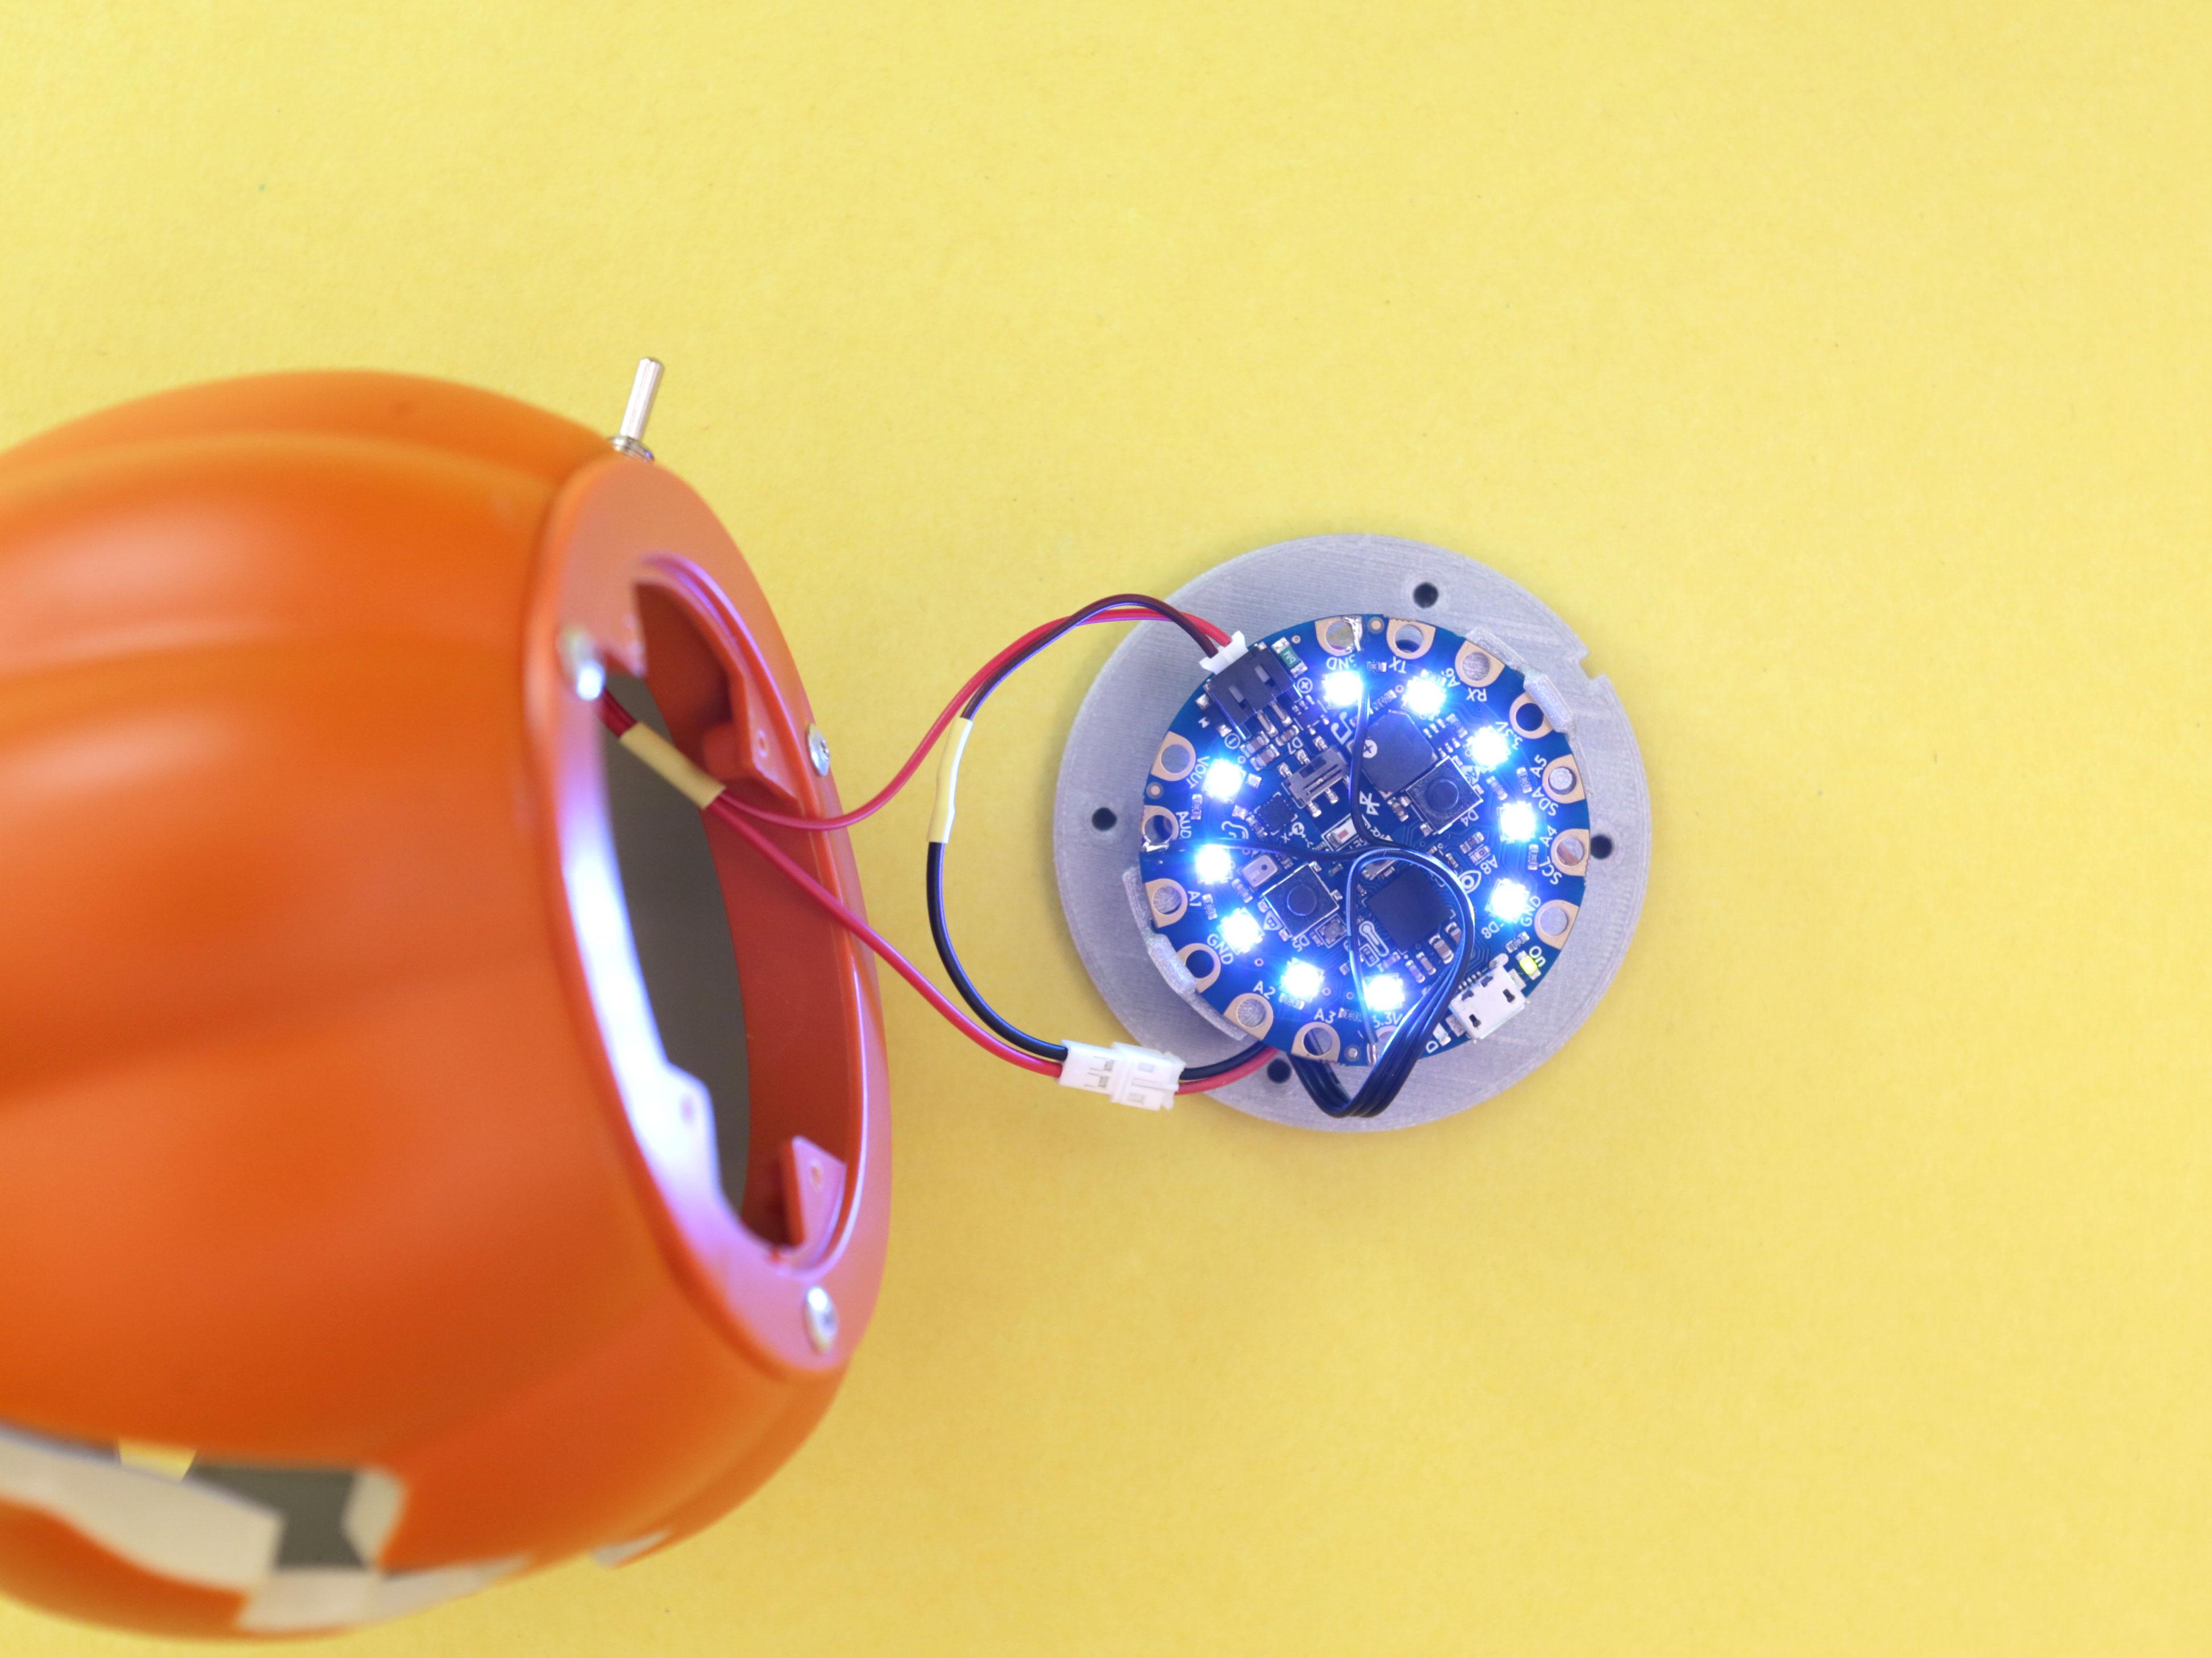 3d_printing_pumpkin-test-circuit.jpg